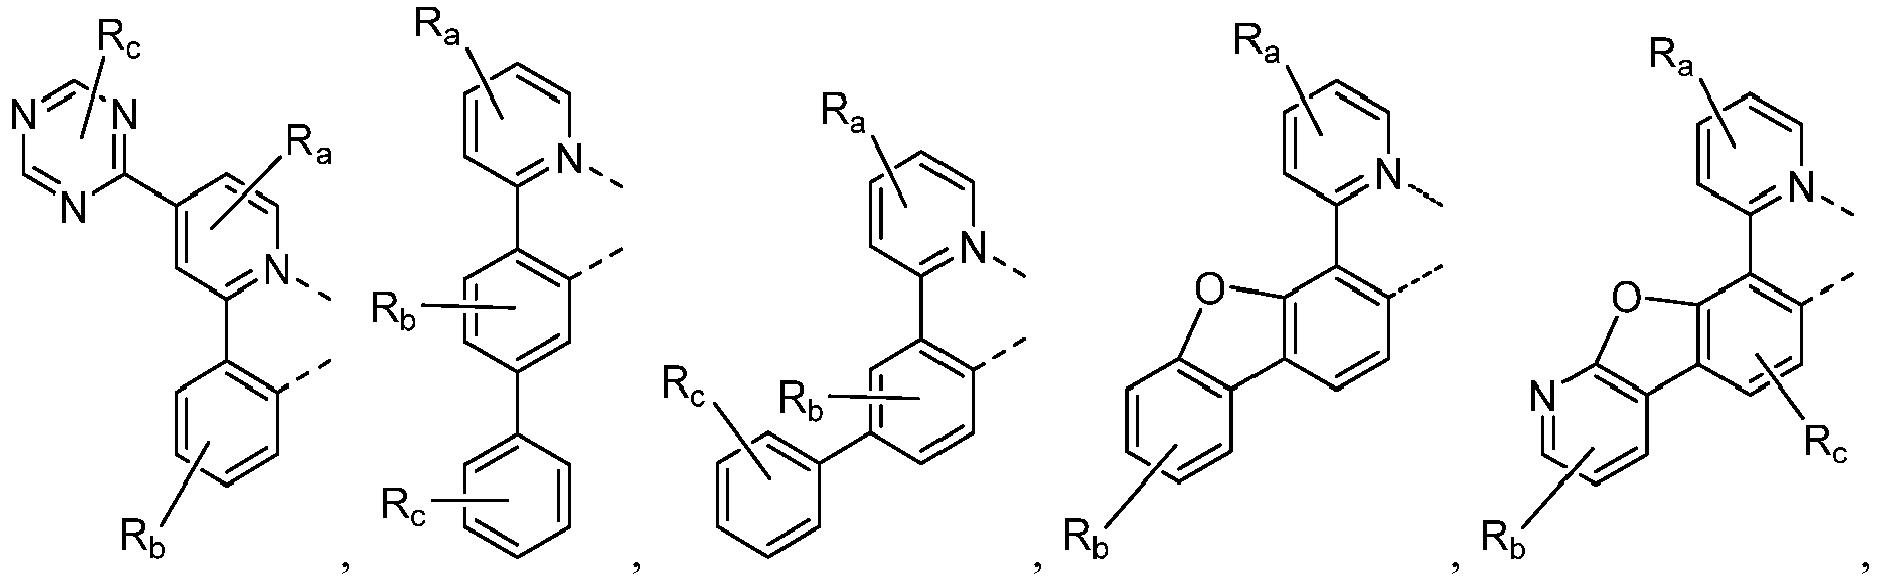 Figure imgb0309